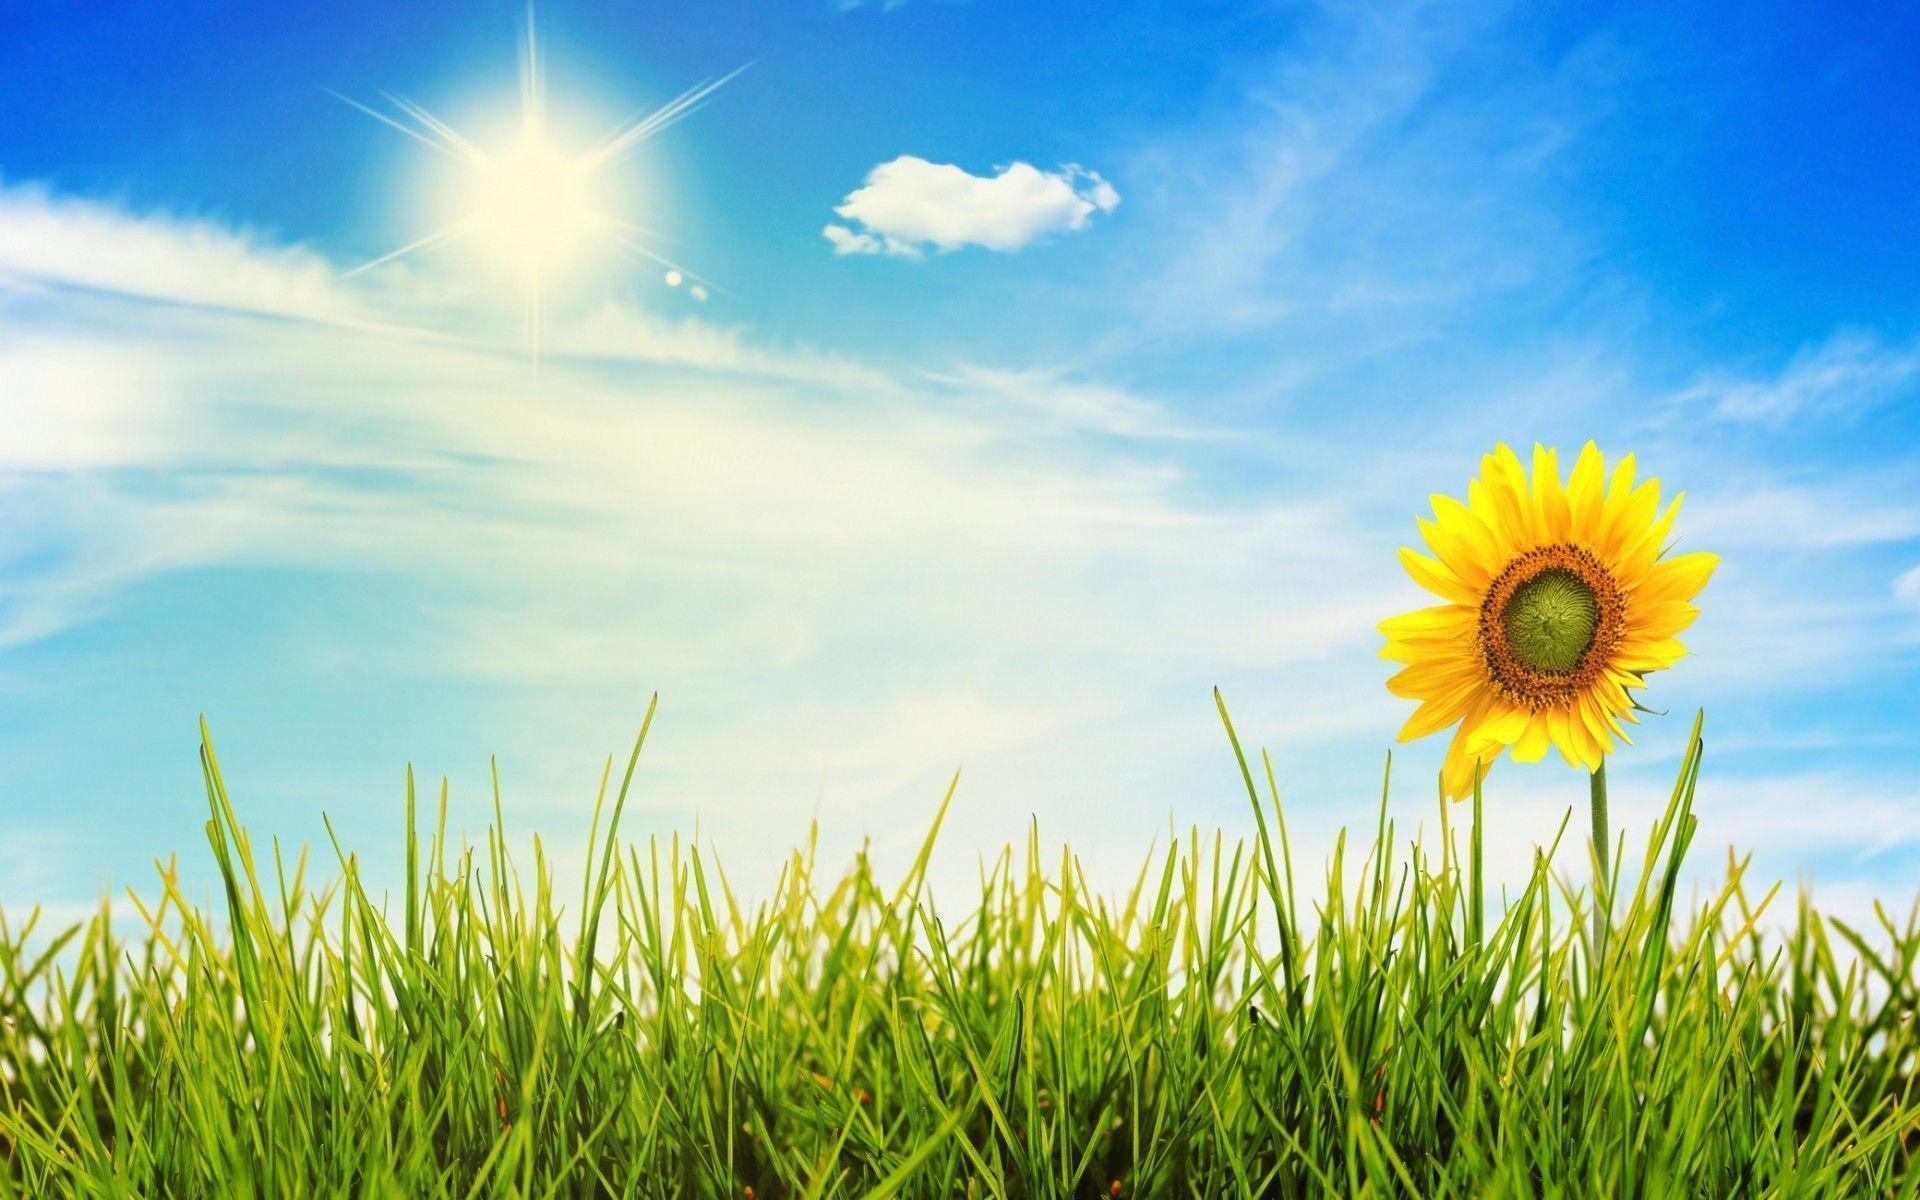 A beautiful sunny day | Flickr - Photo Sharing!  |Sunny Beautiful Day